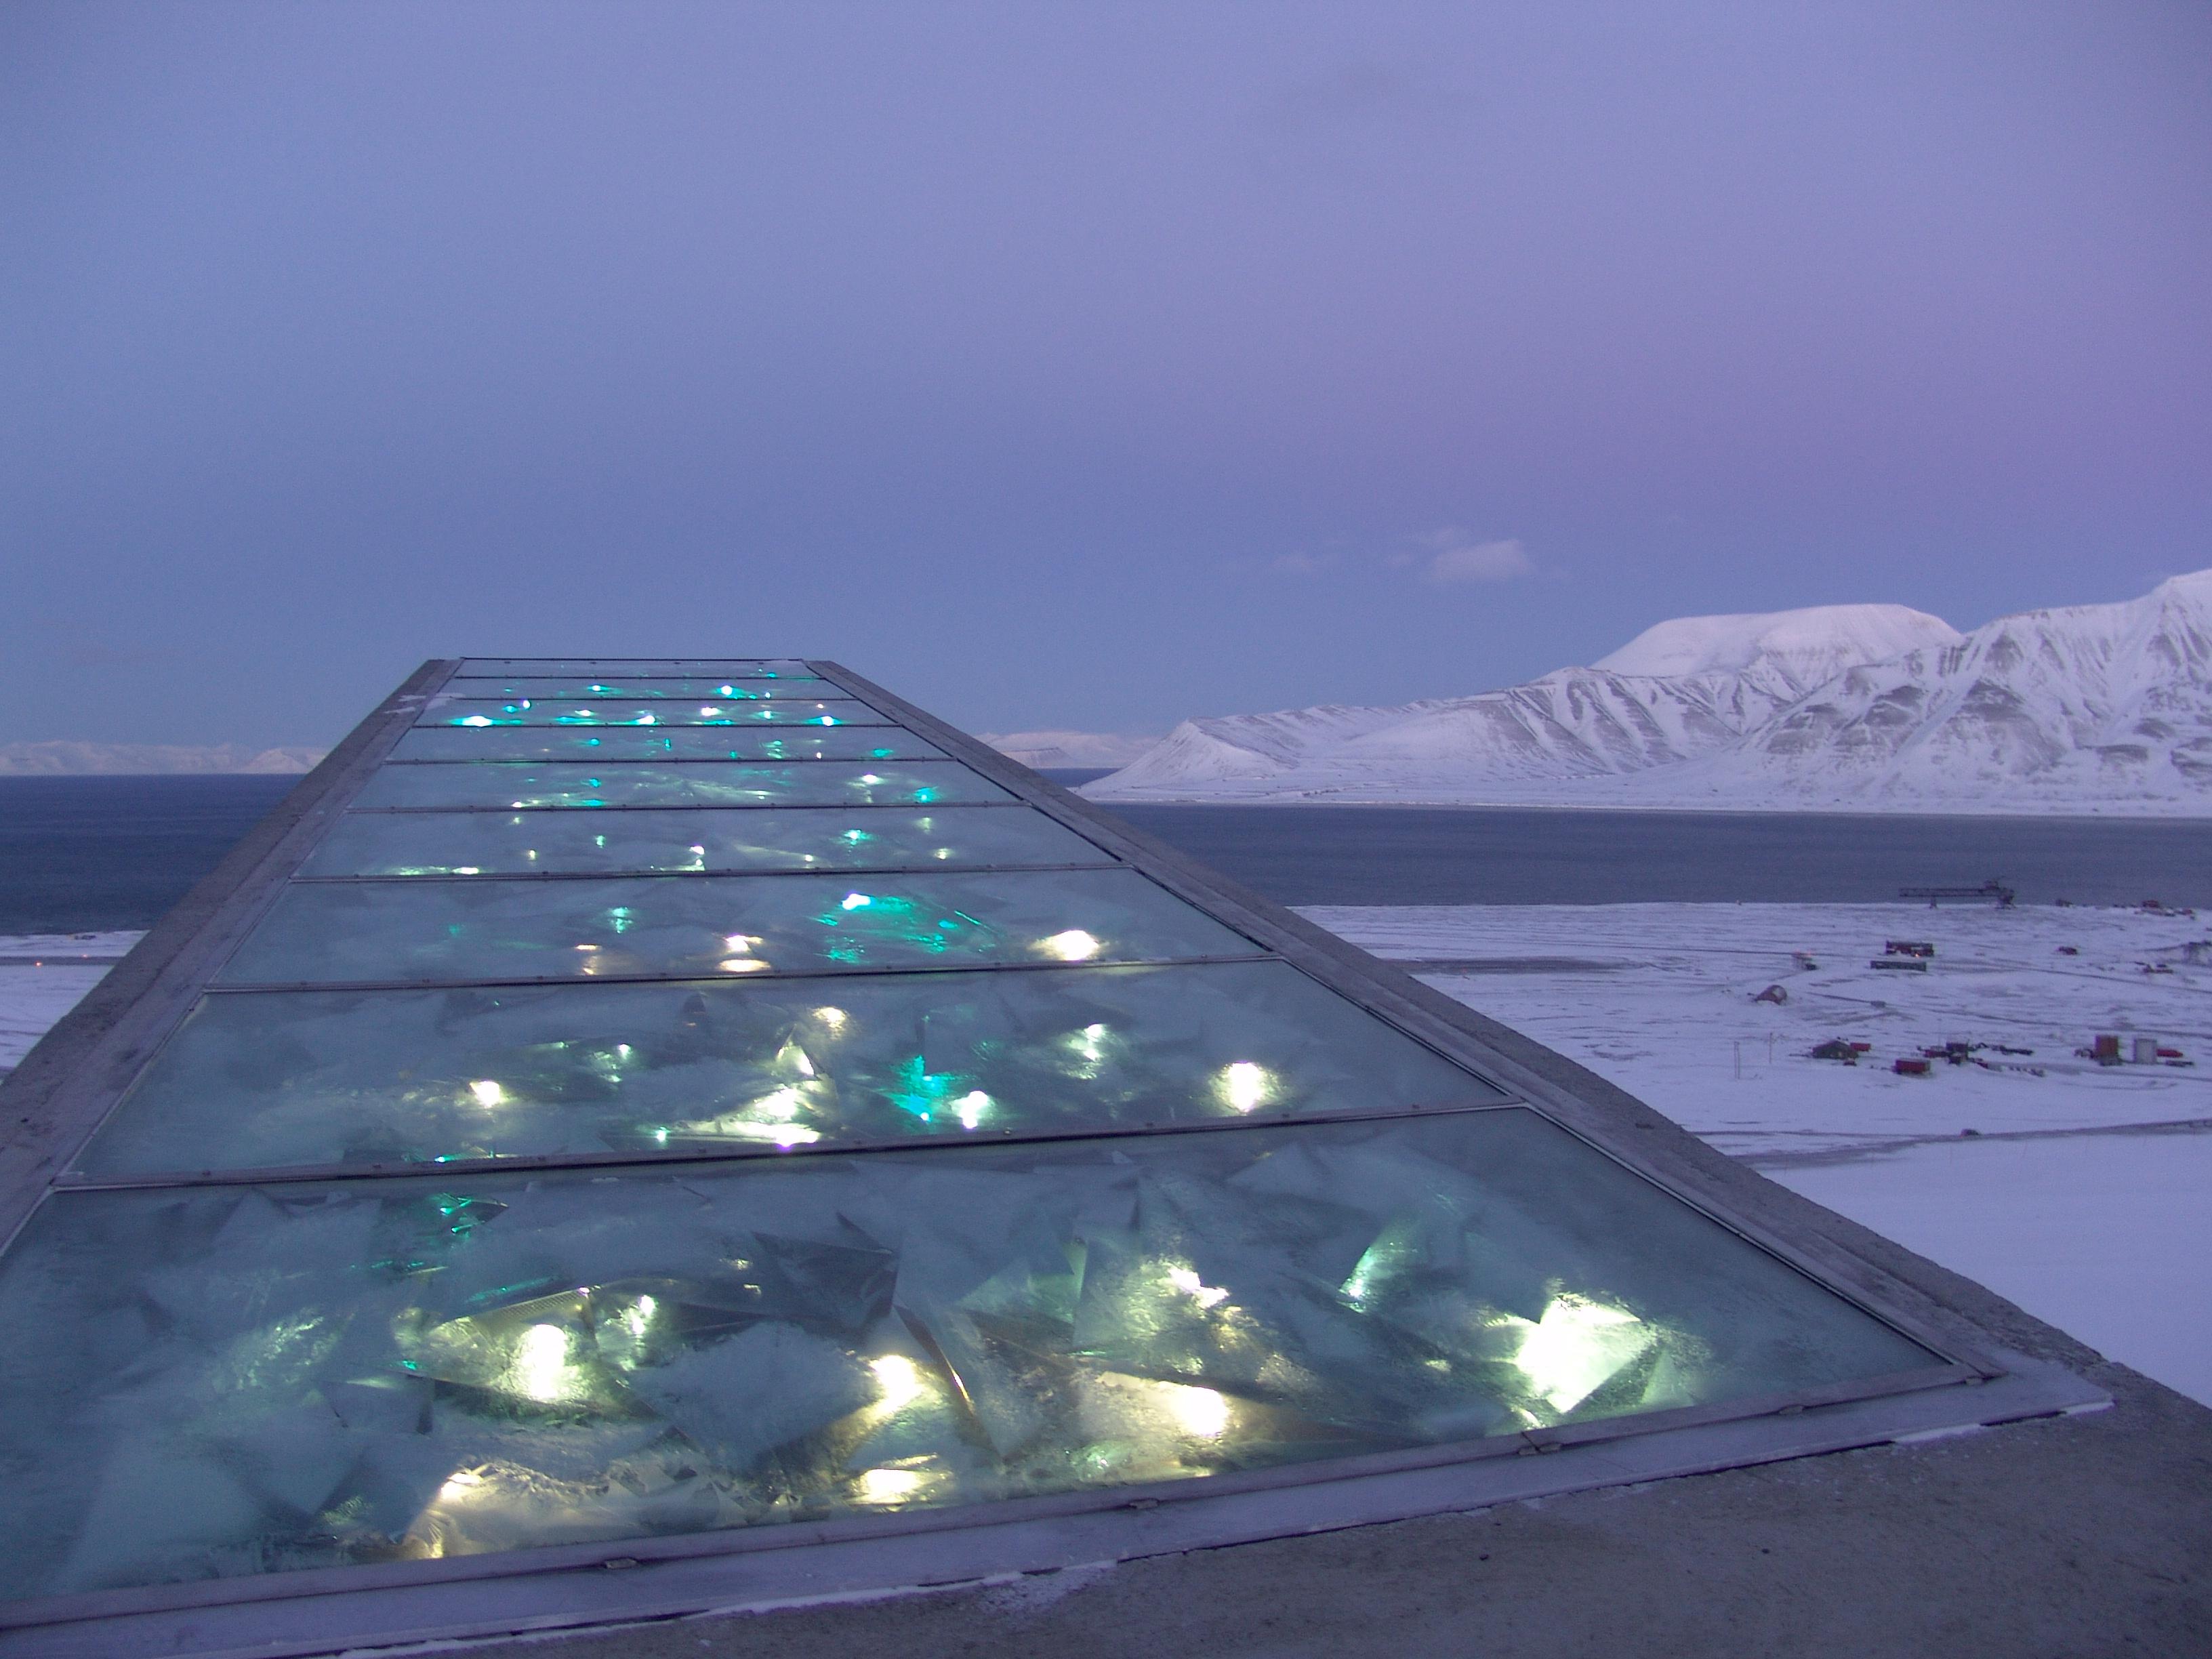 Scorcio della banca dei semi Svalbard Global Seed Vault in Norvegia